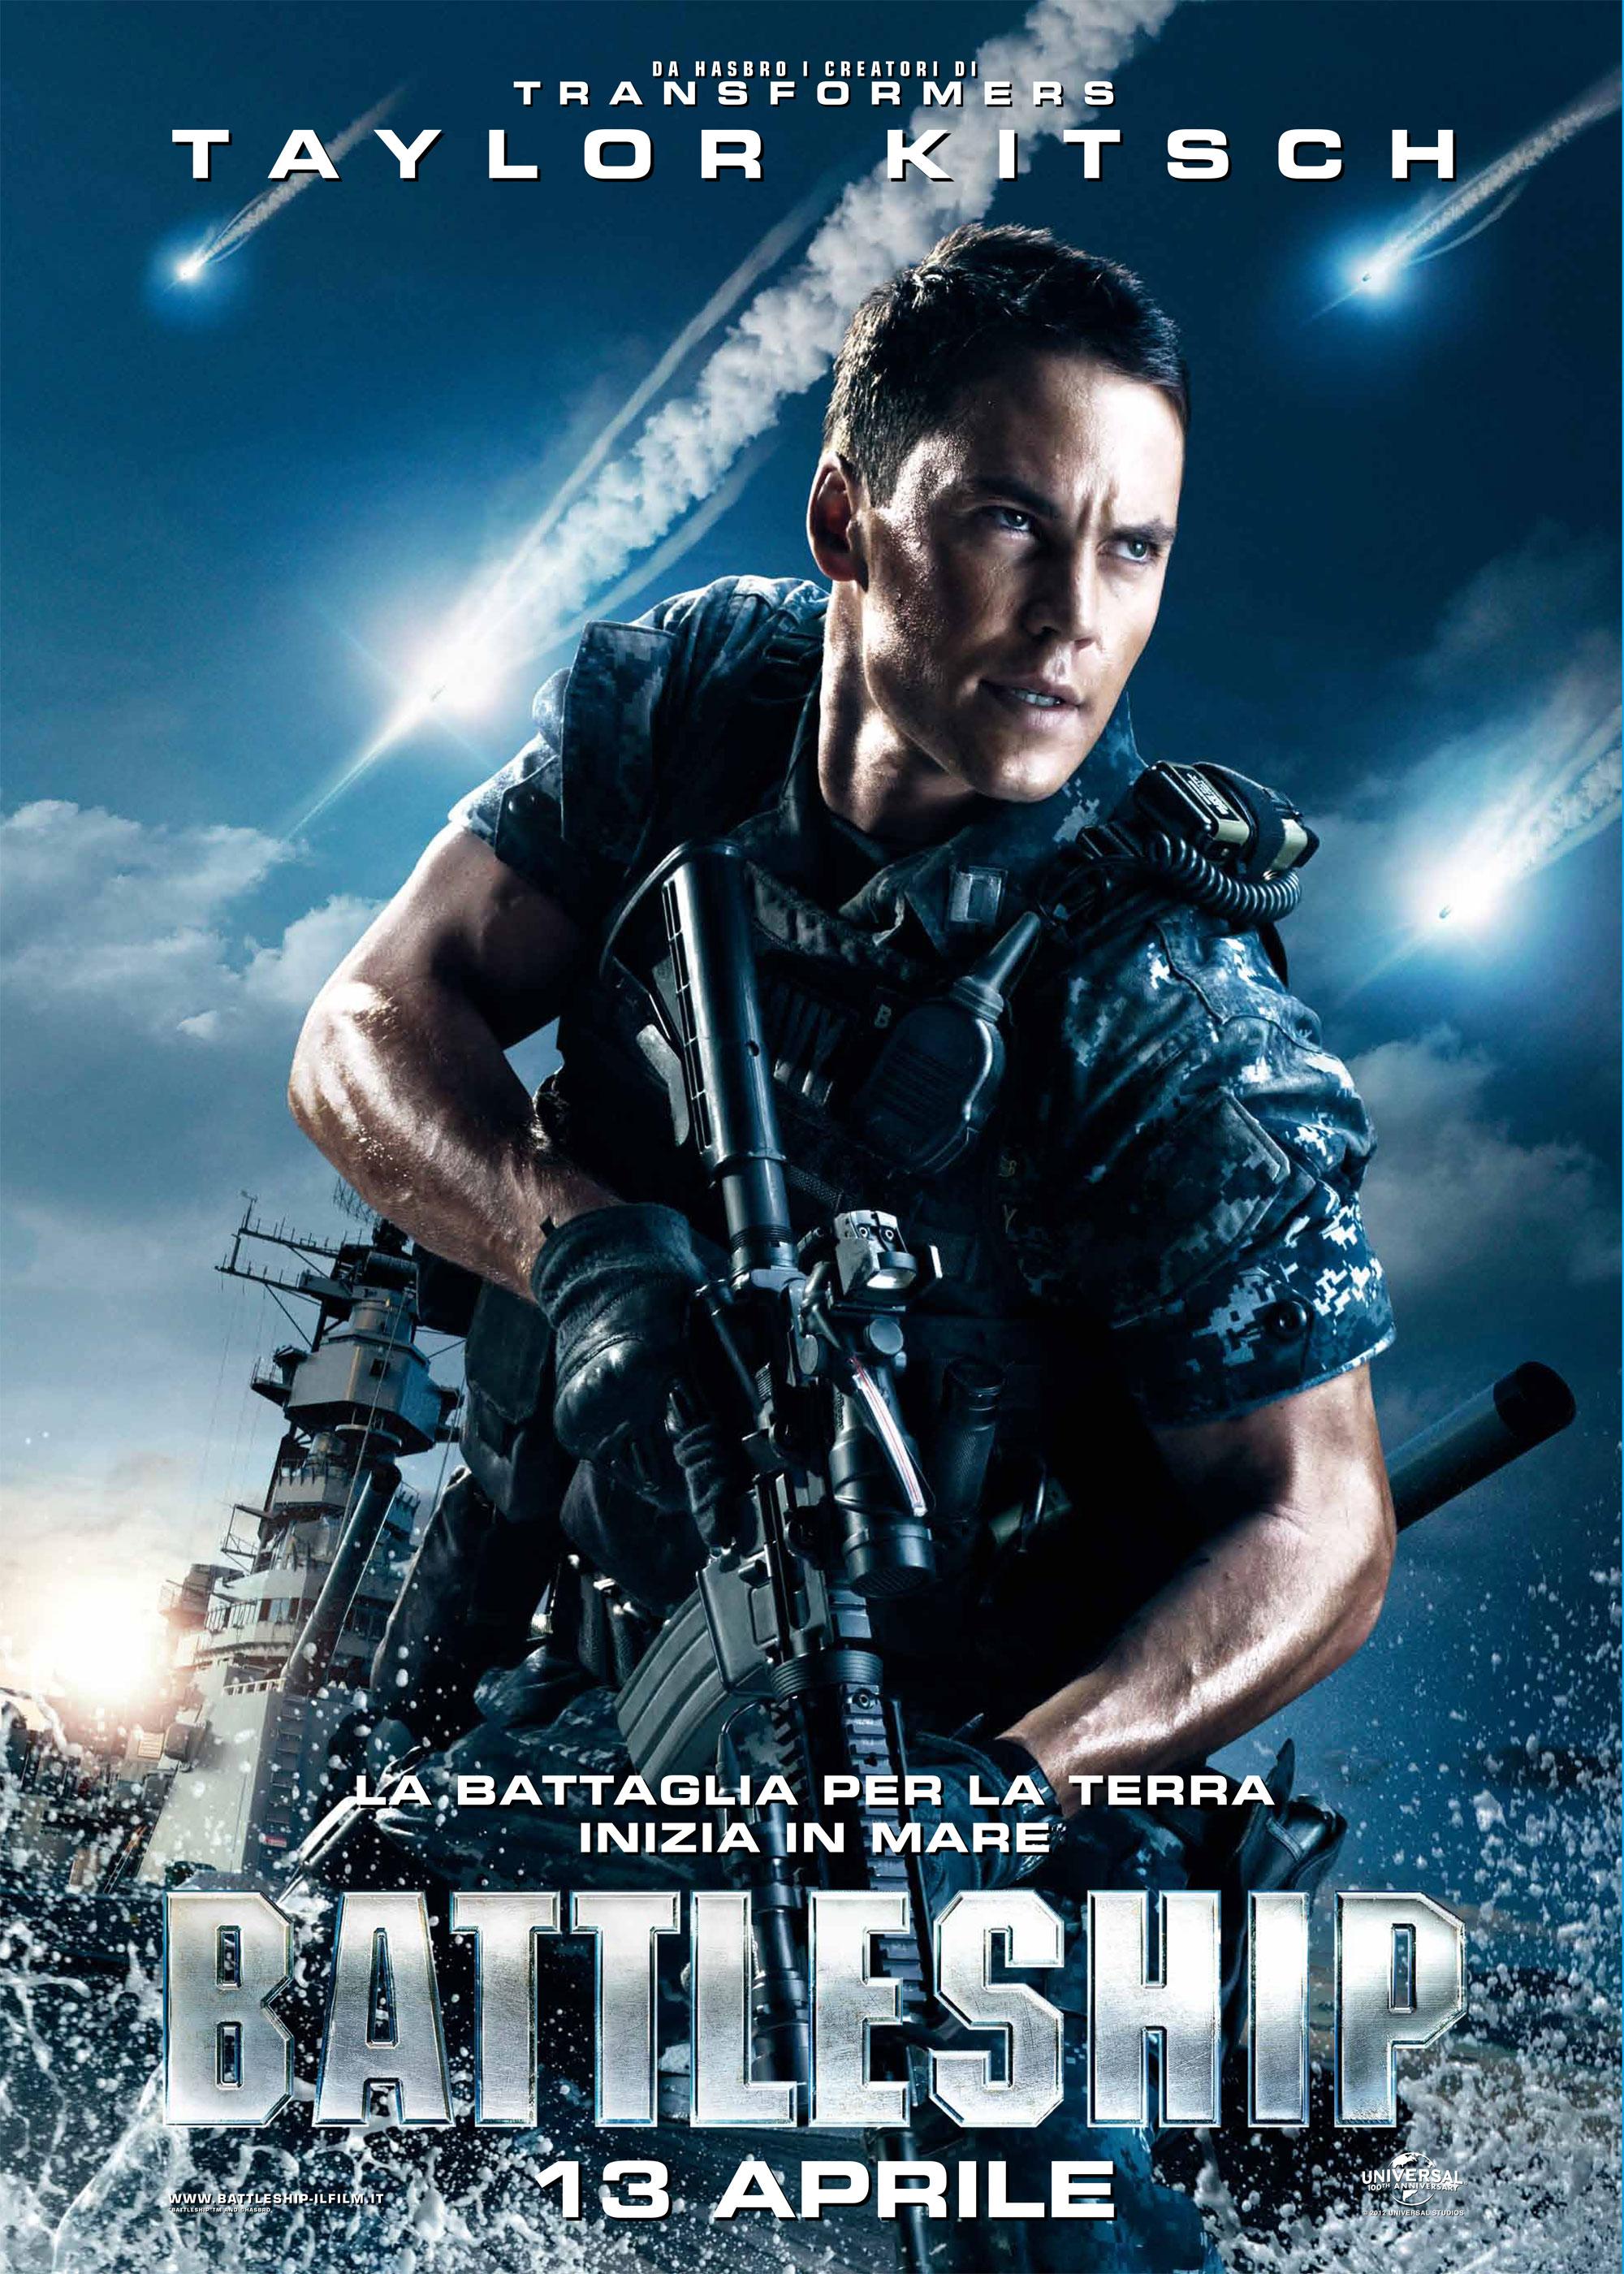 http://collider.com/wp-content/uploads/battleship-movie-poster-taylor-kitsch.jpg